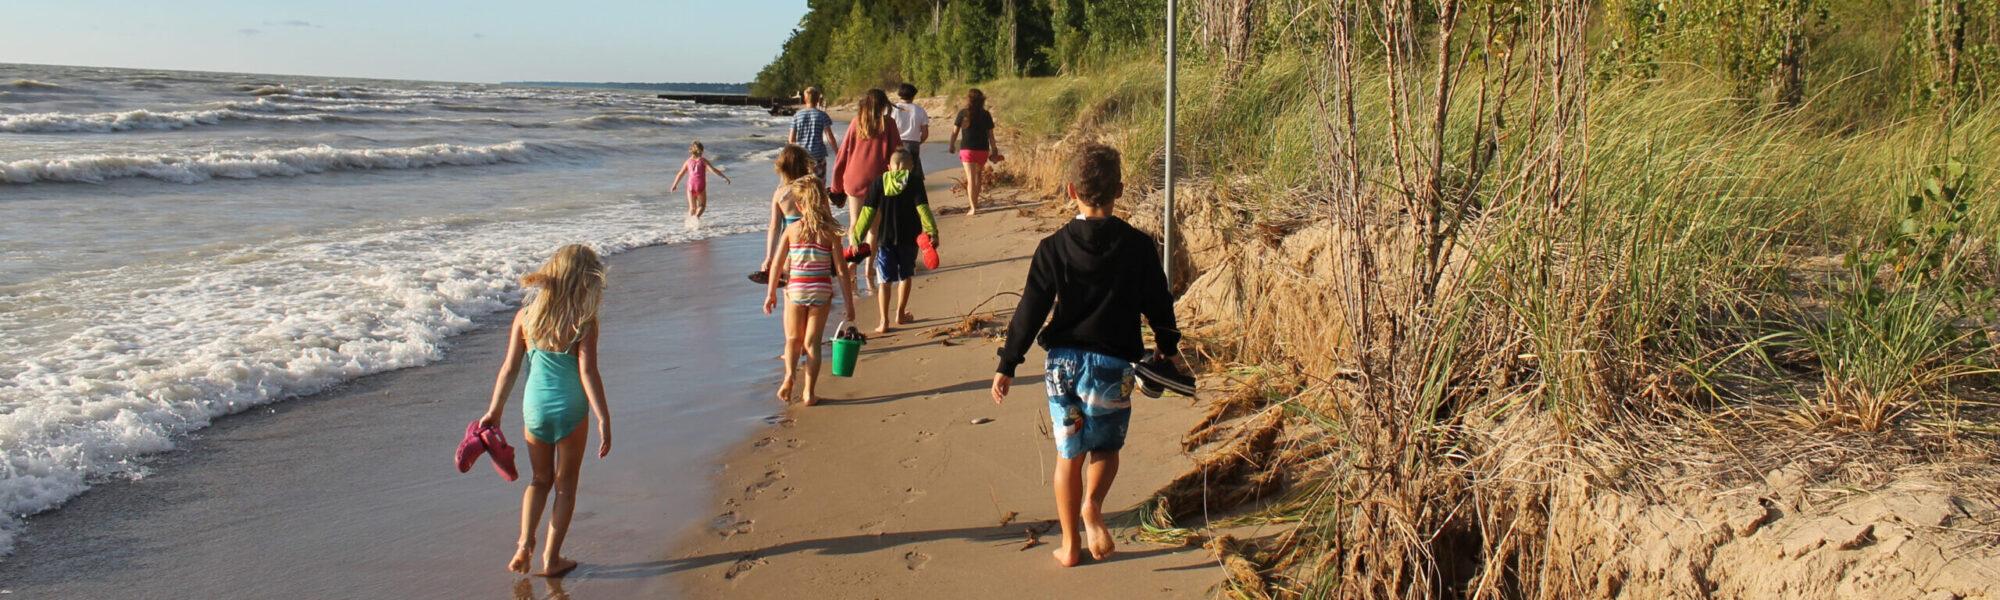 people walking on the beach of Lake Huron